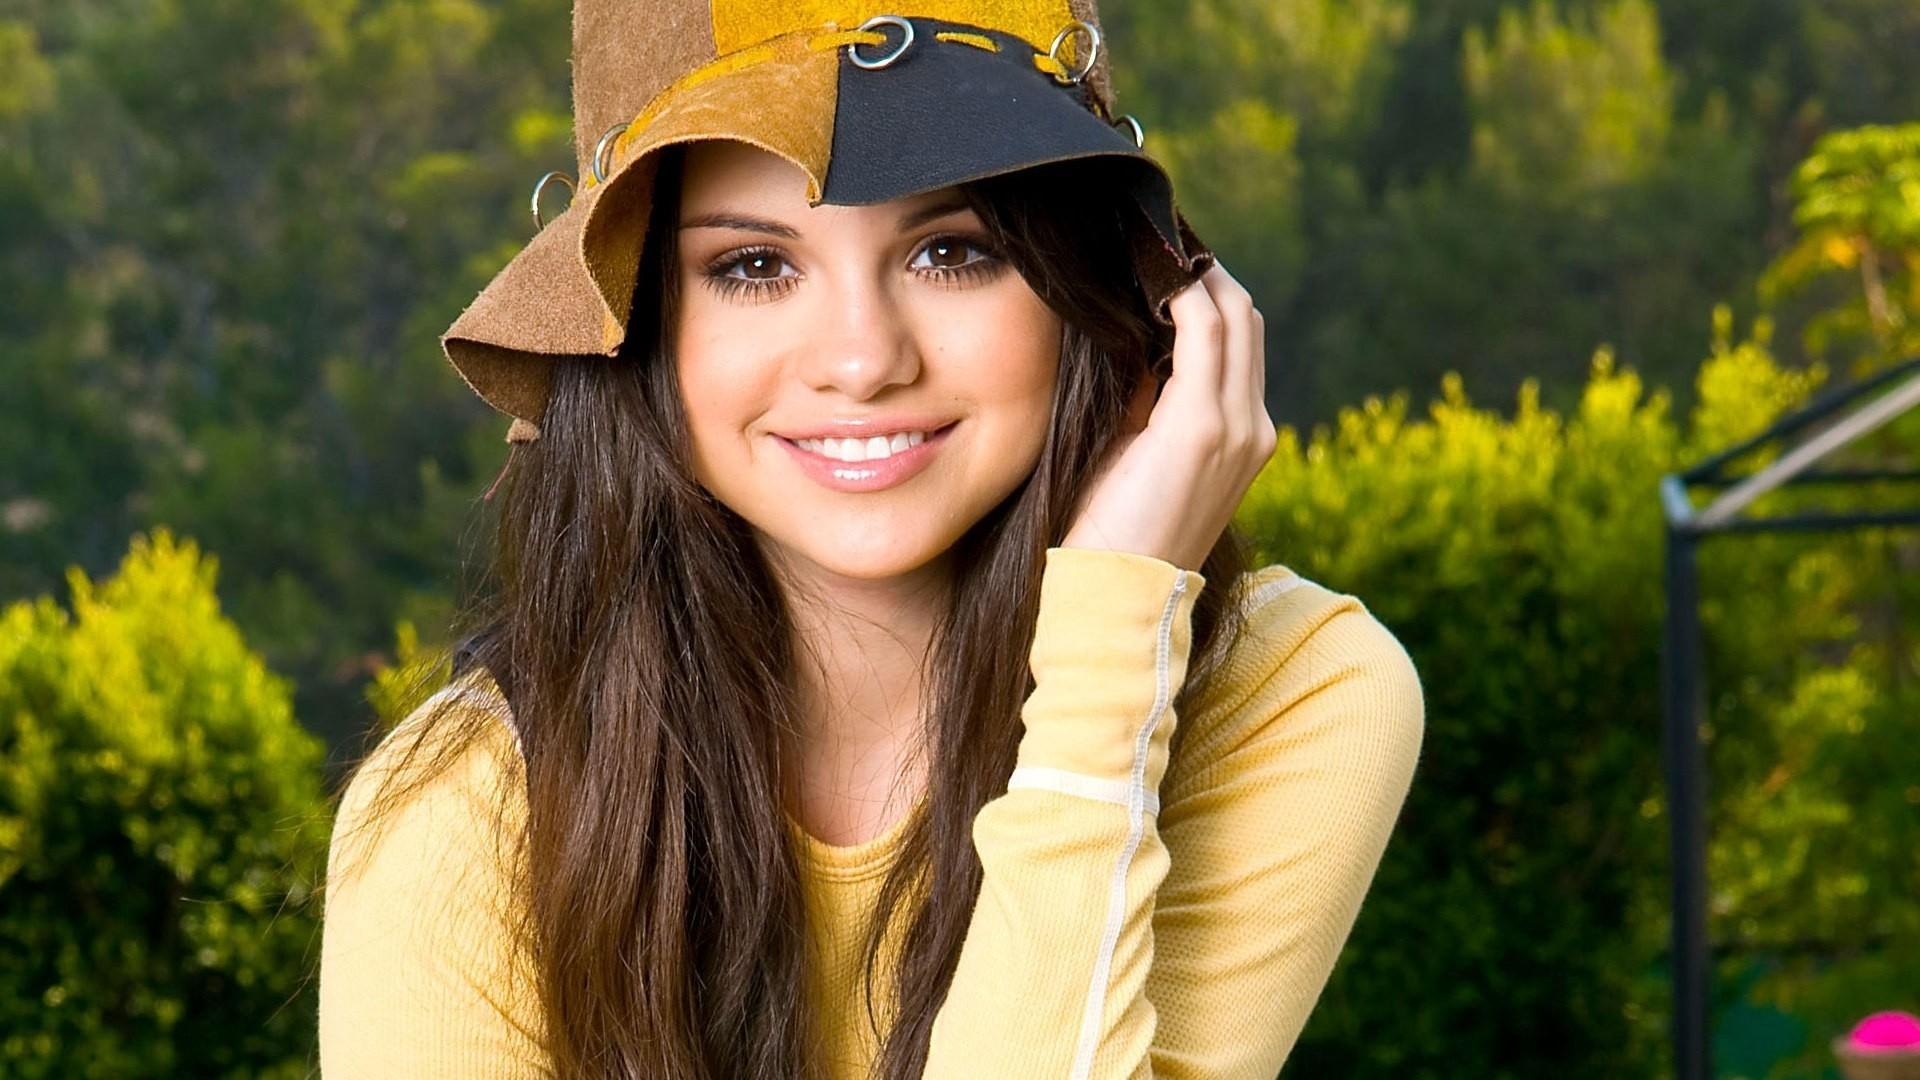 Selena Gomez hd desktop wallpaper